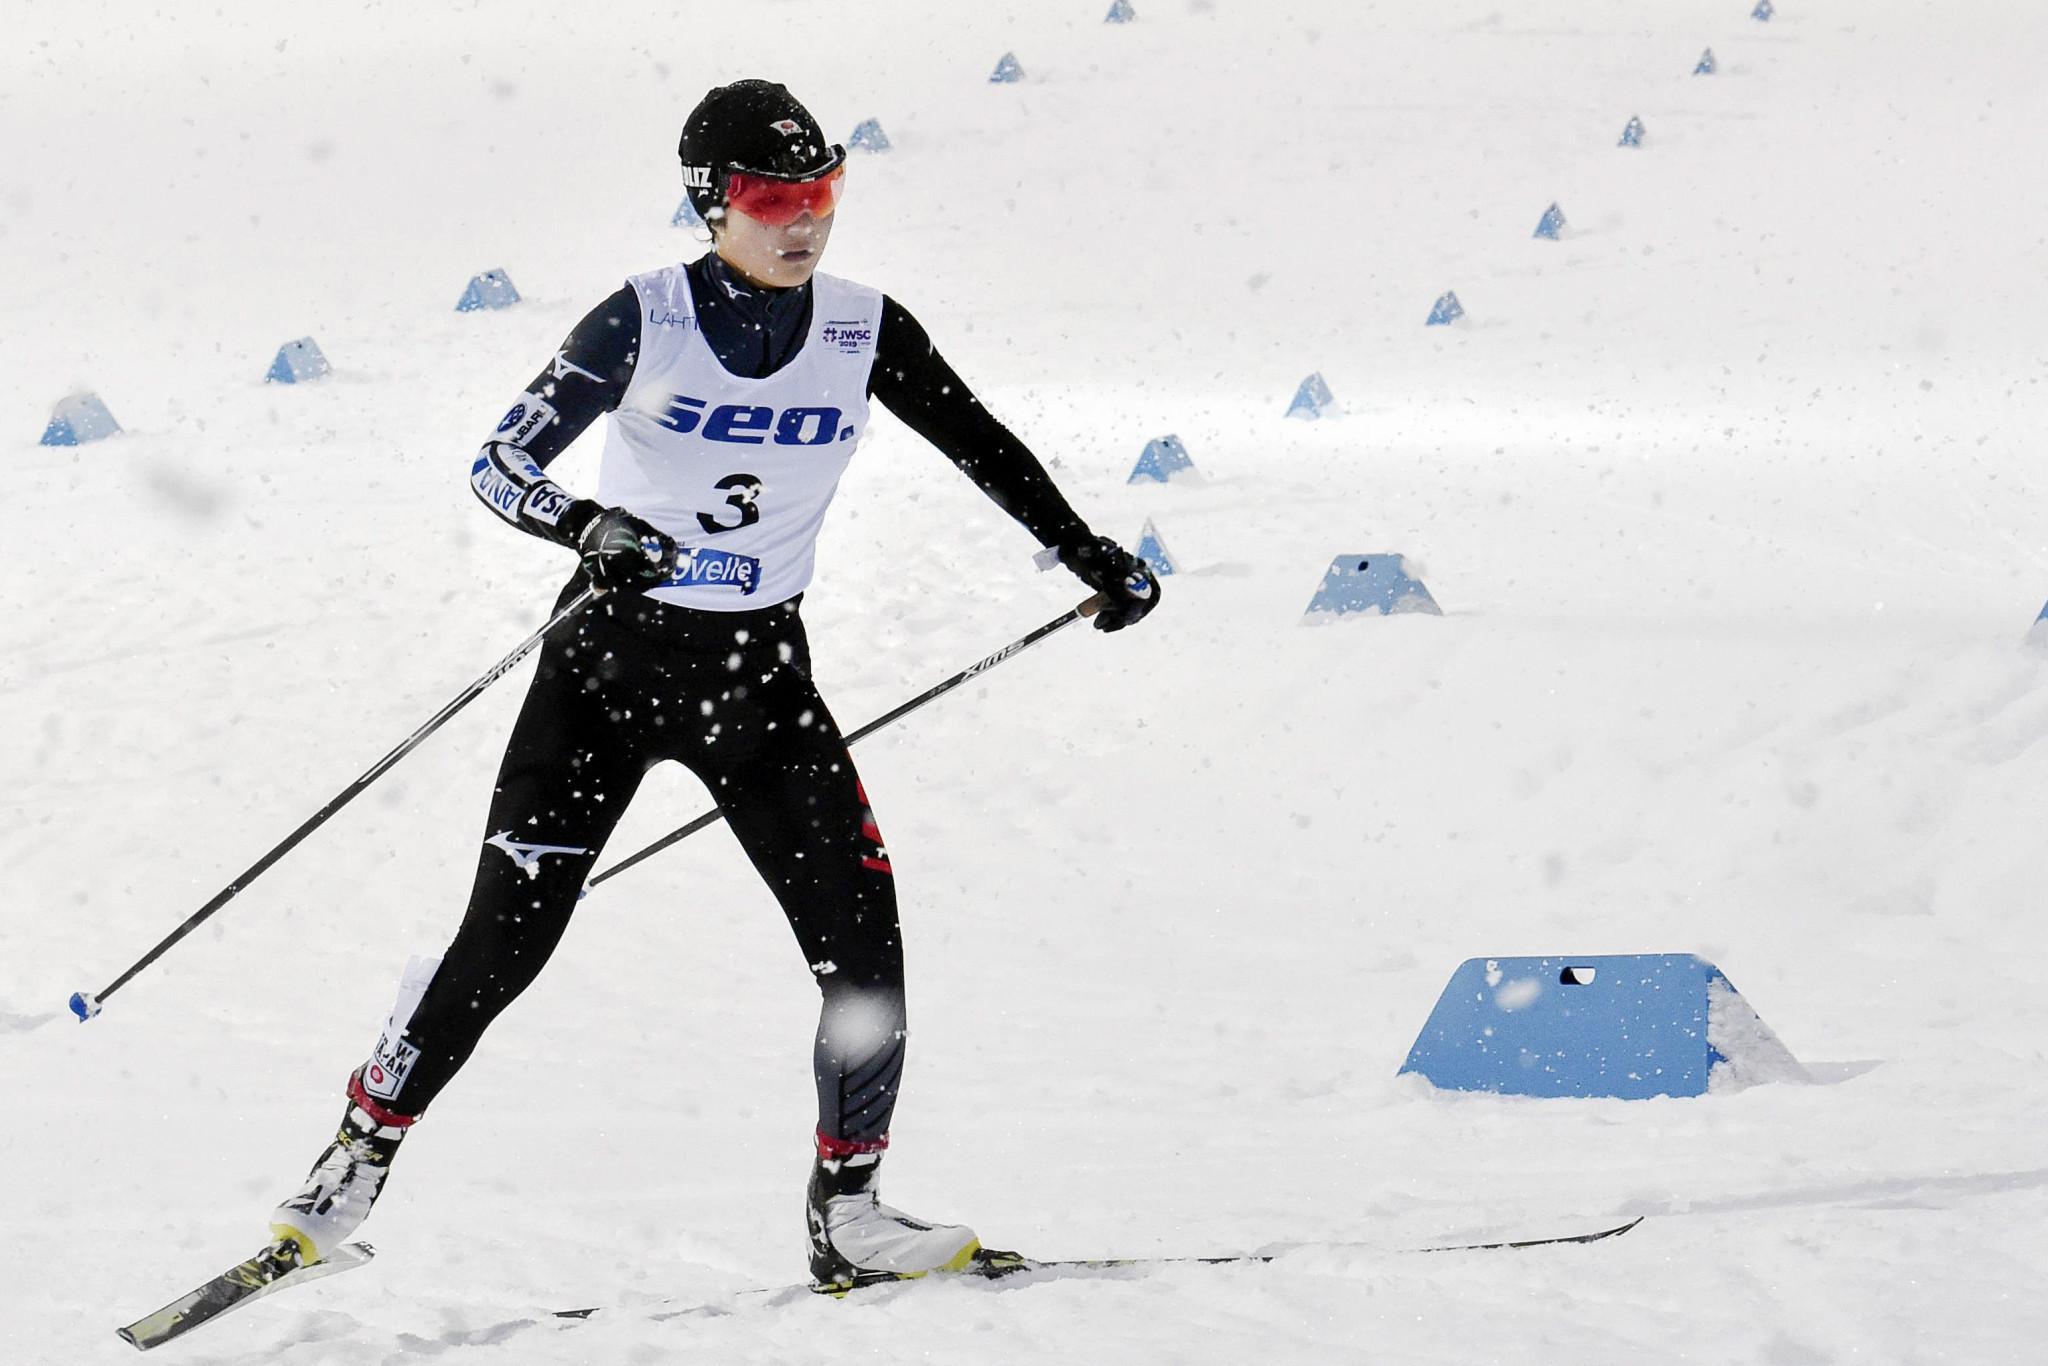 Nordic Junior World Ski Championships to get underway in Vuokatti